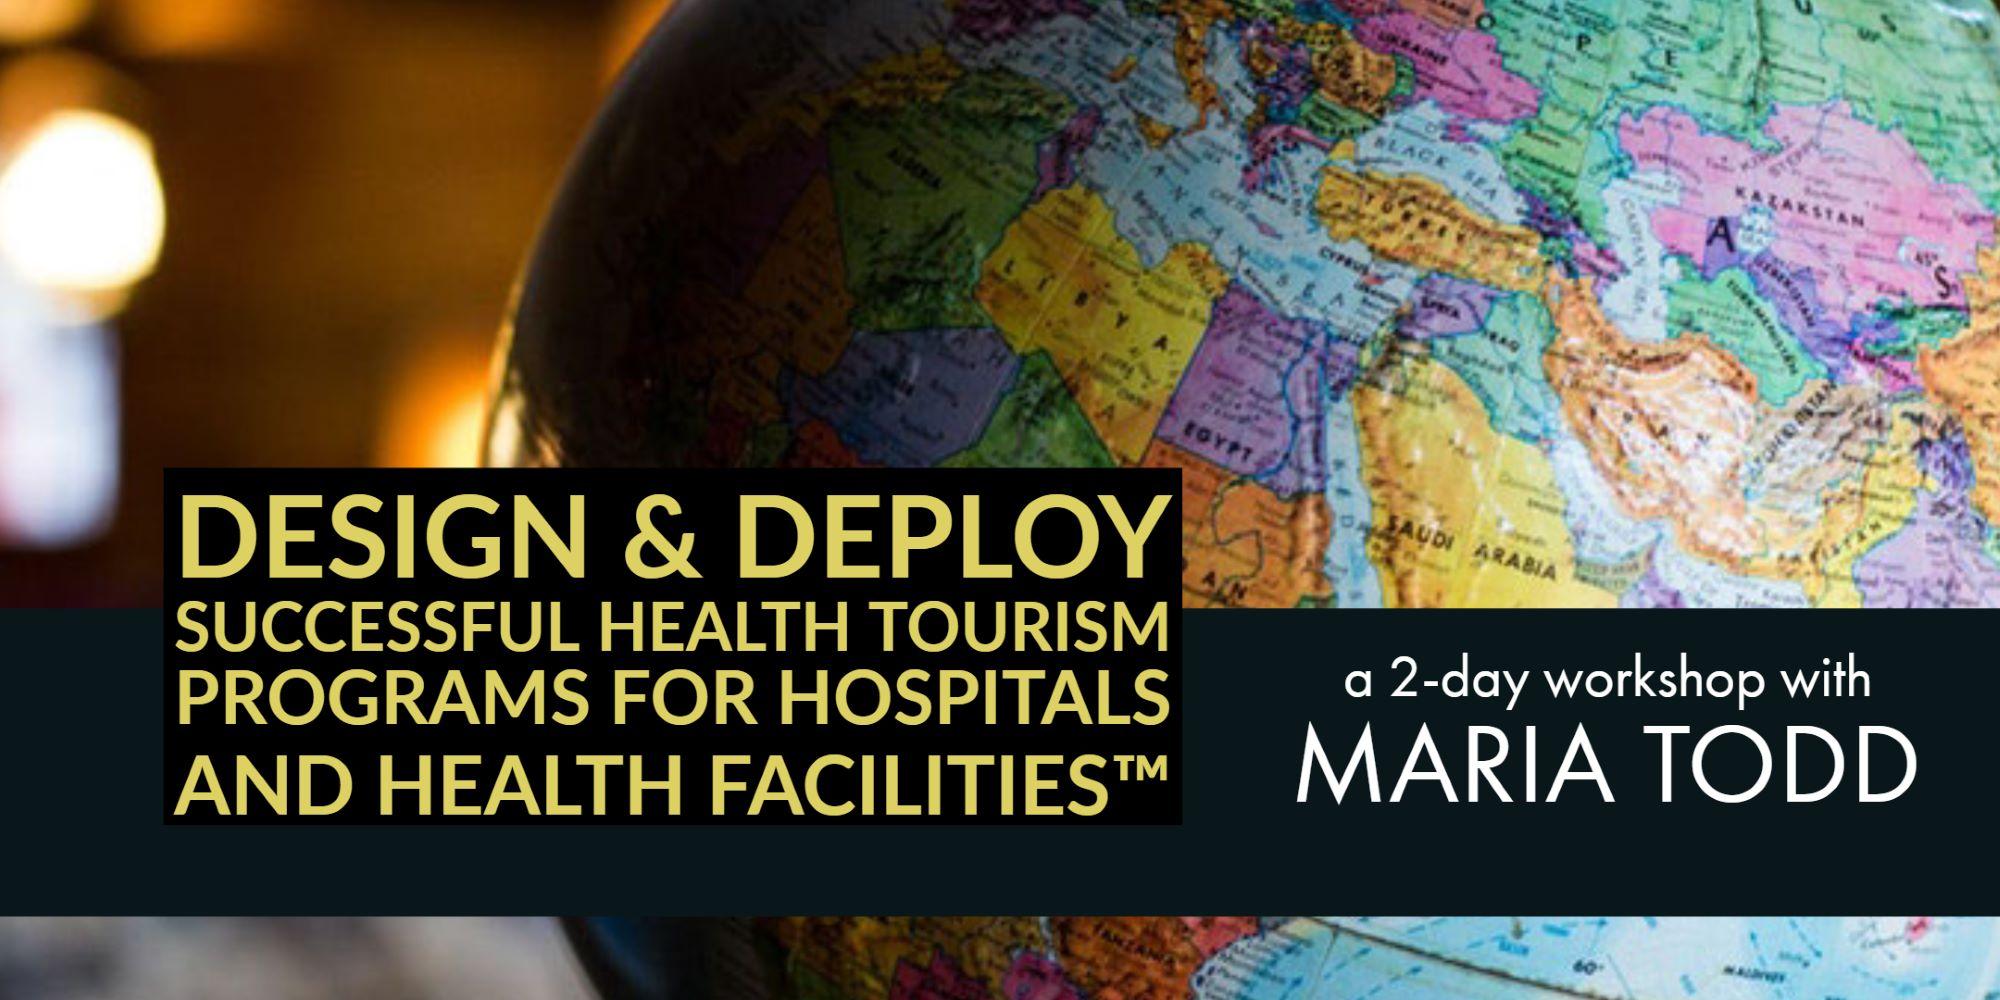 AskMariaTodd medical tourism hospital training and coaching